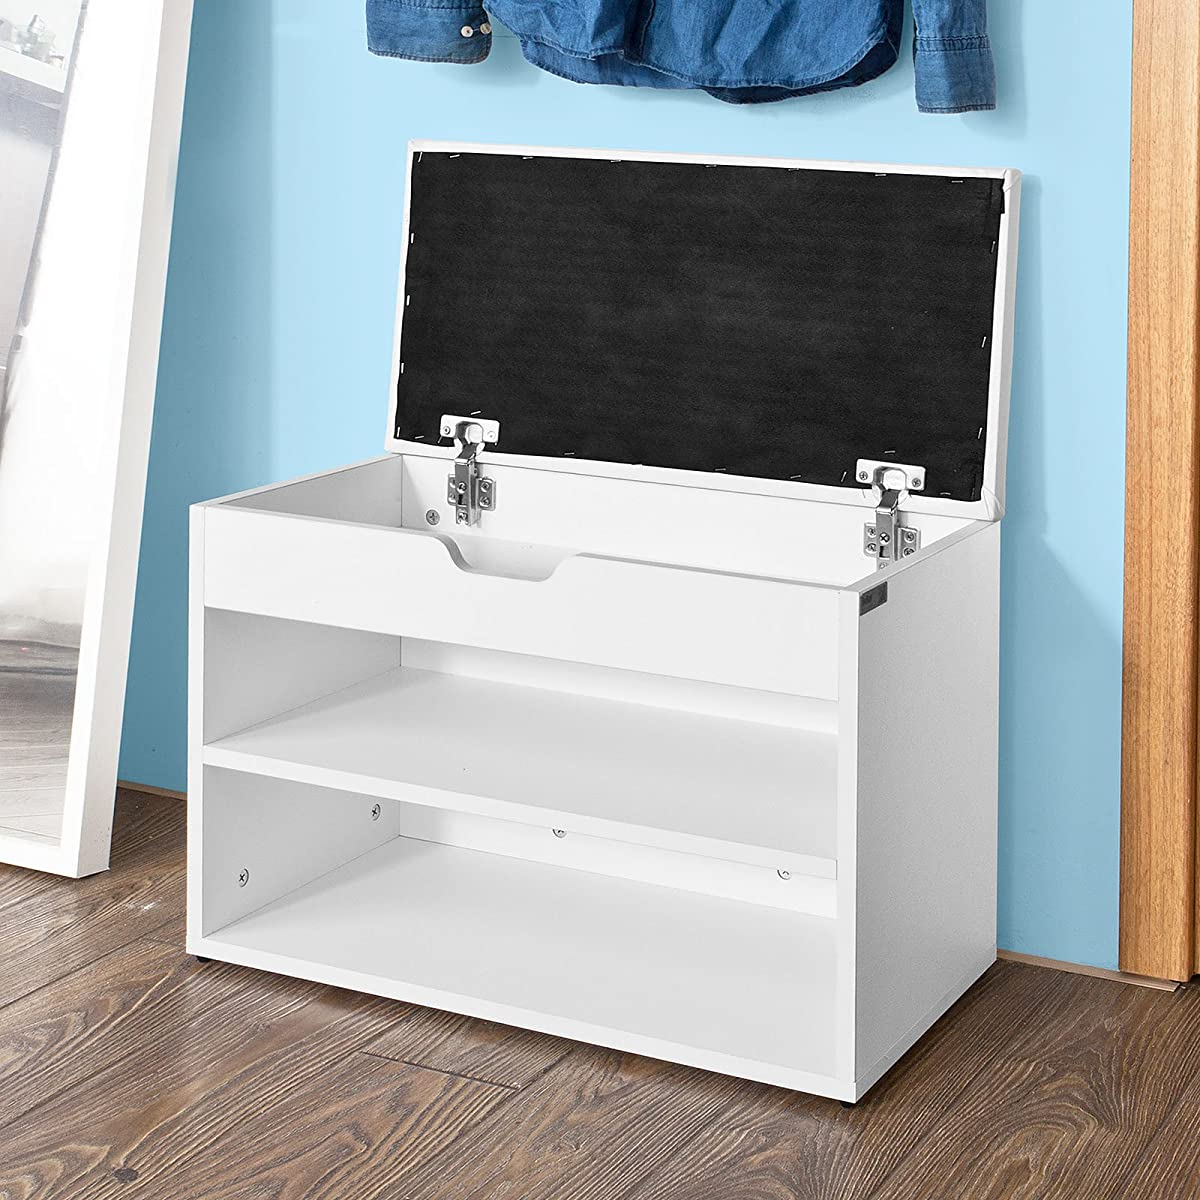 SoBuy FSR25-W, Wooden Shoe Cabinet, 2 Tiers Shoe Storage Bench Shoe Rack with Folding Padded Seat, 60x30x44cm, White